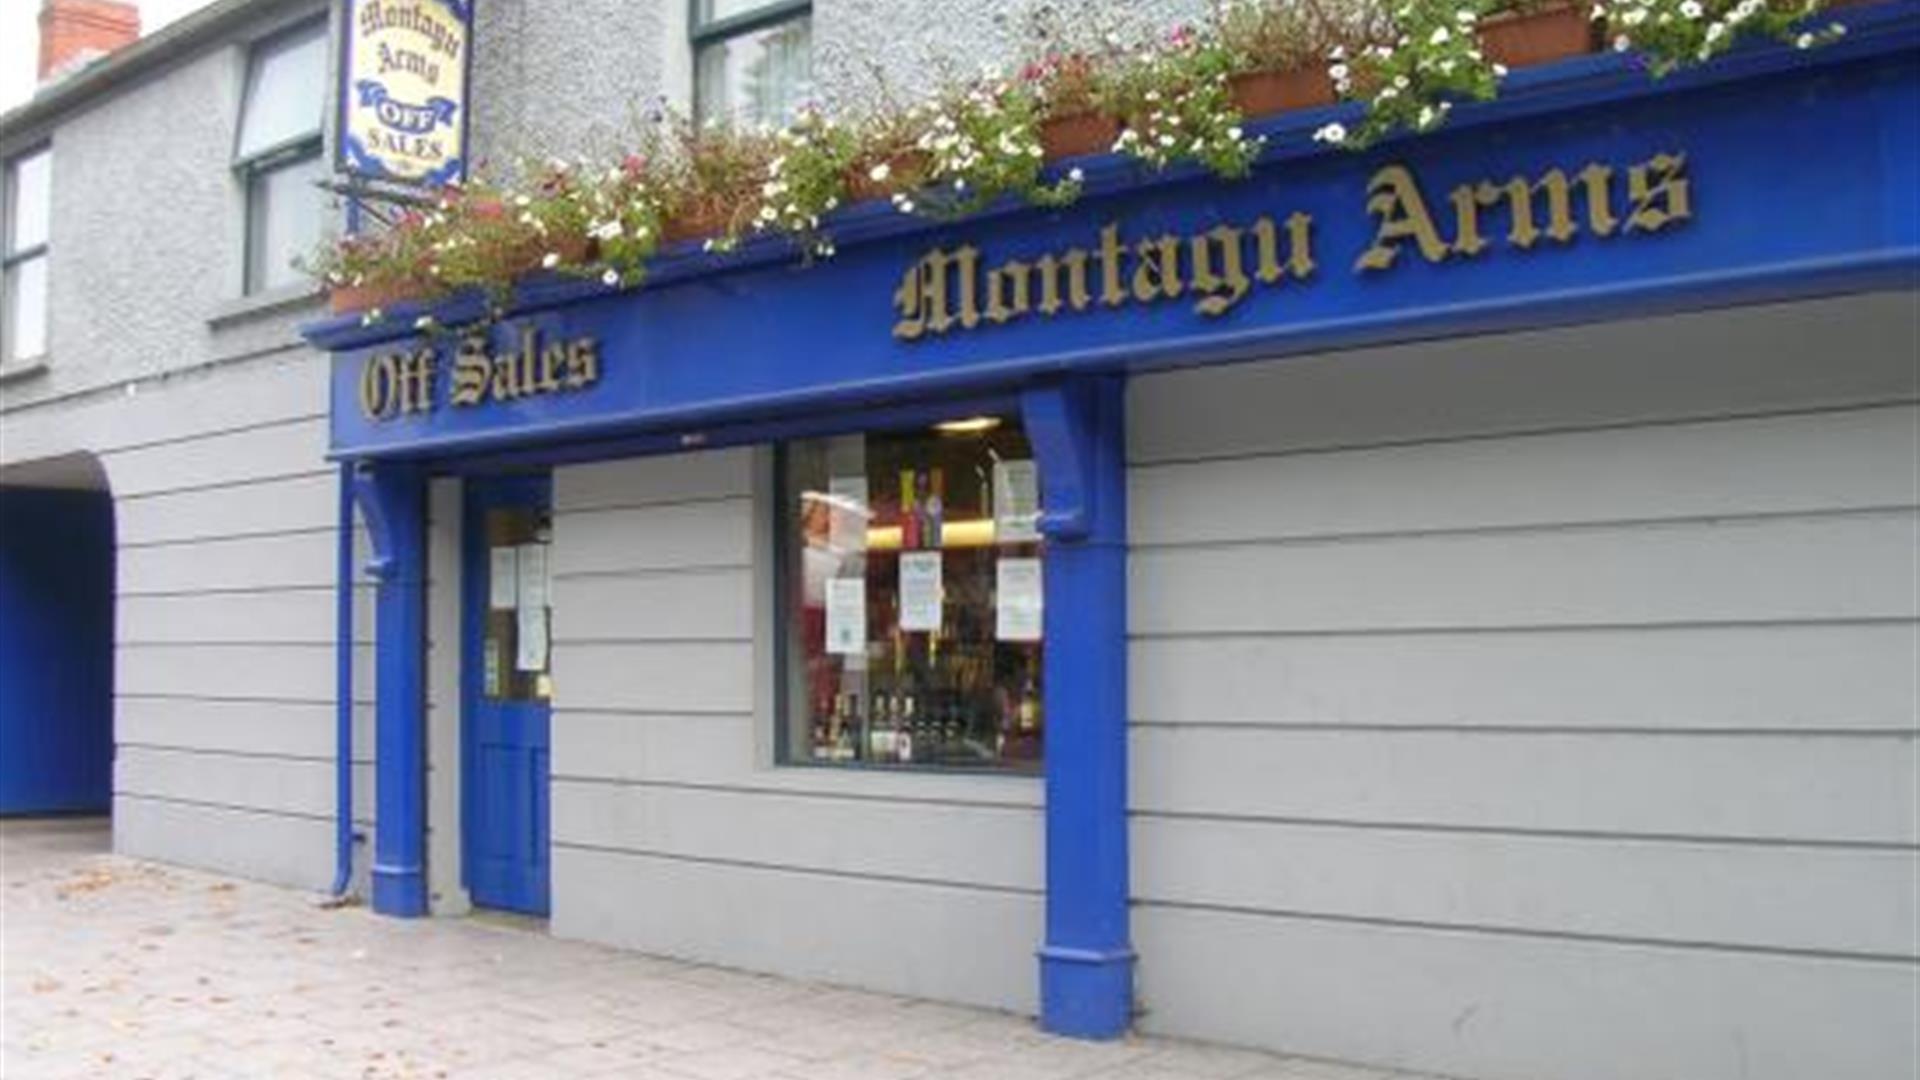 Montagu Arms Bar and Restaurant